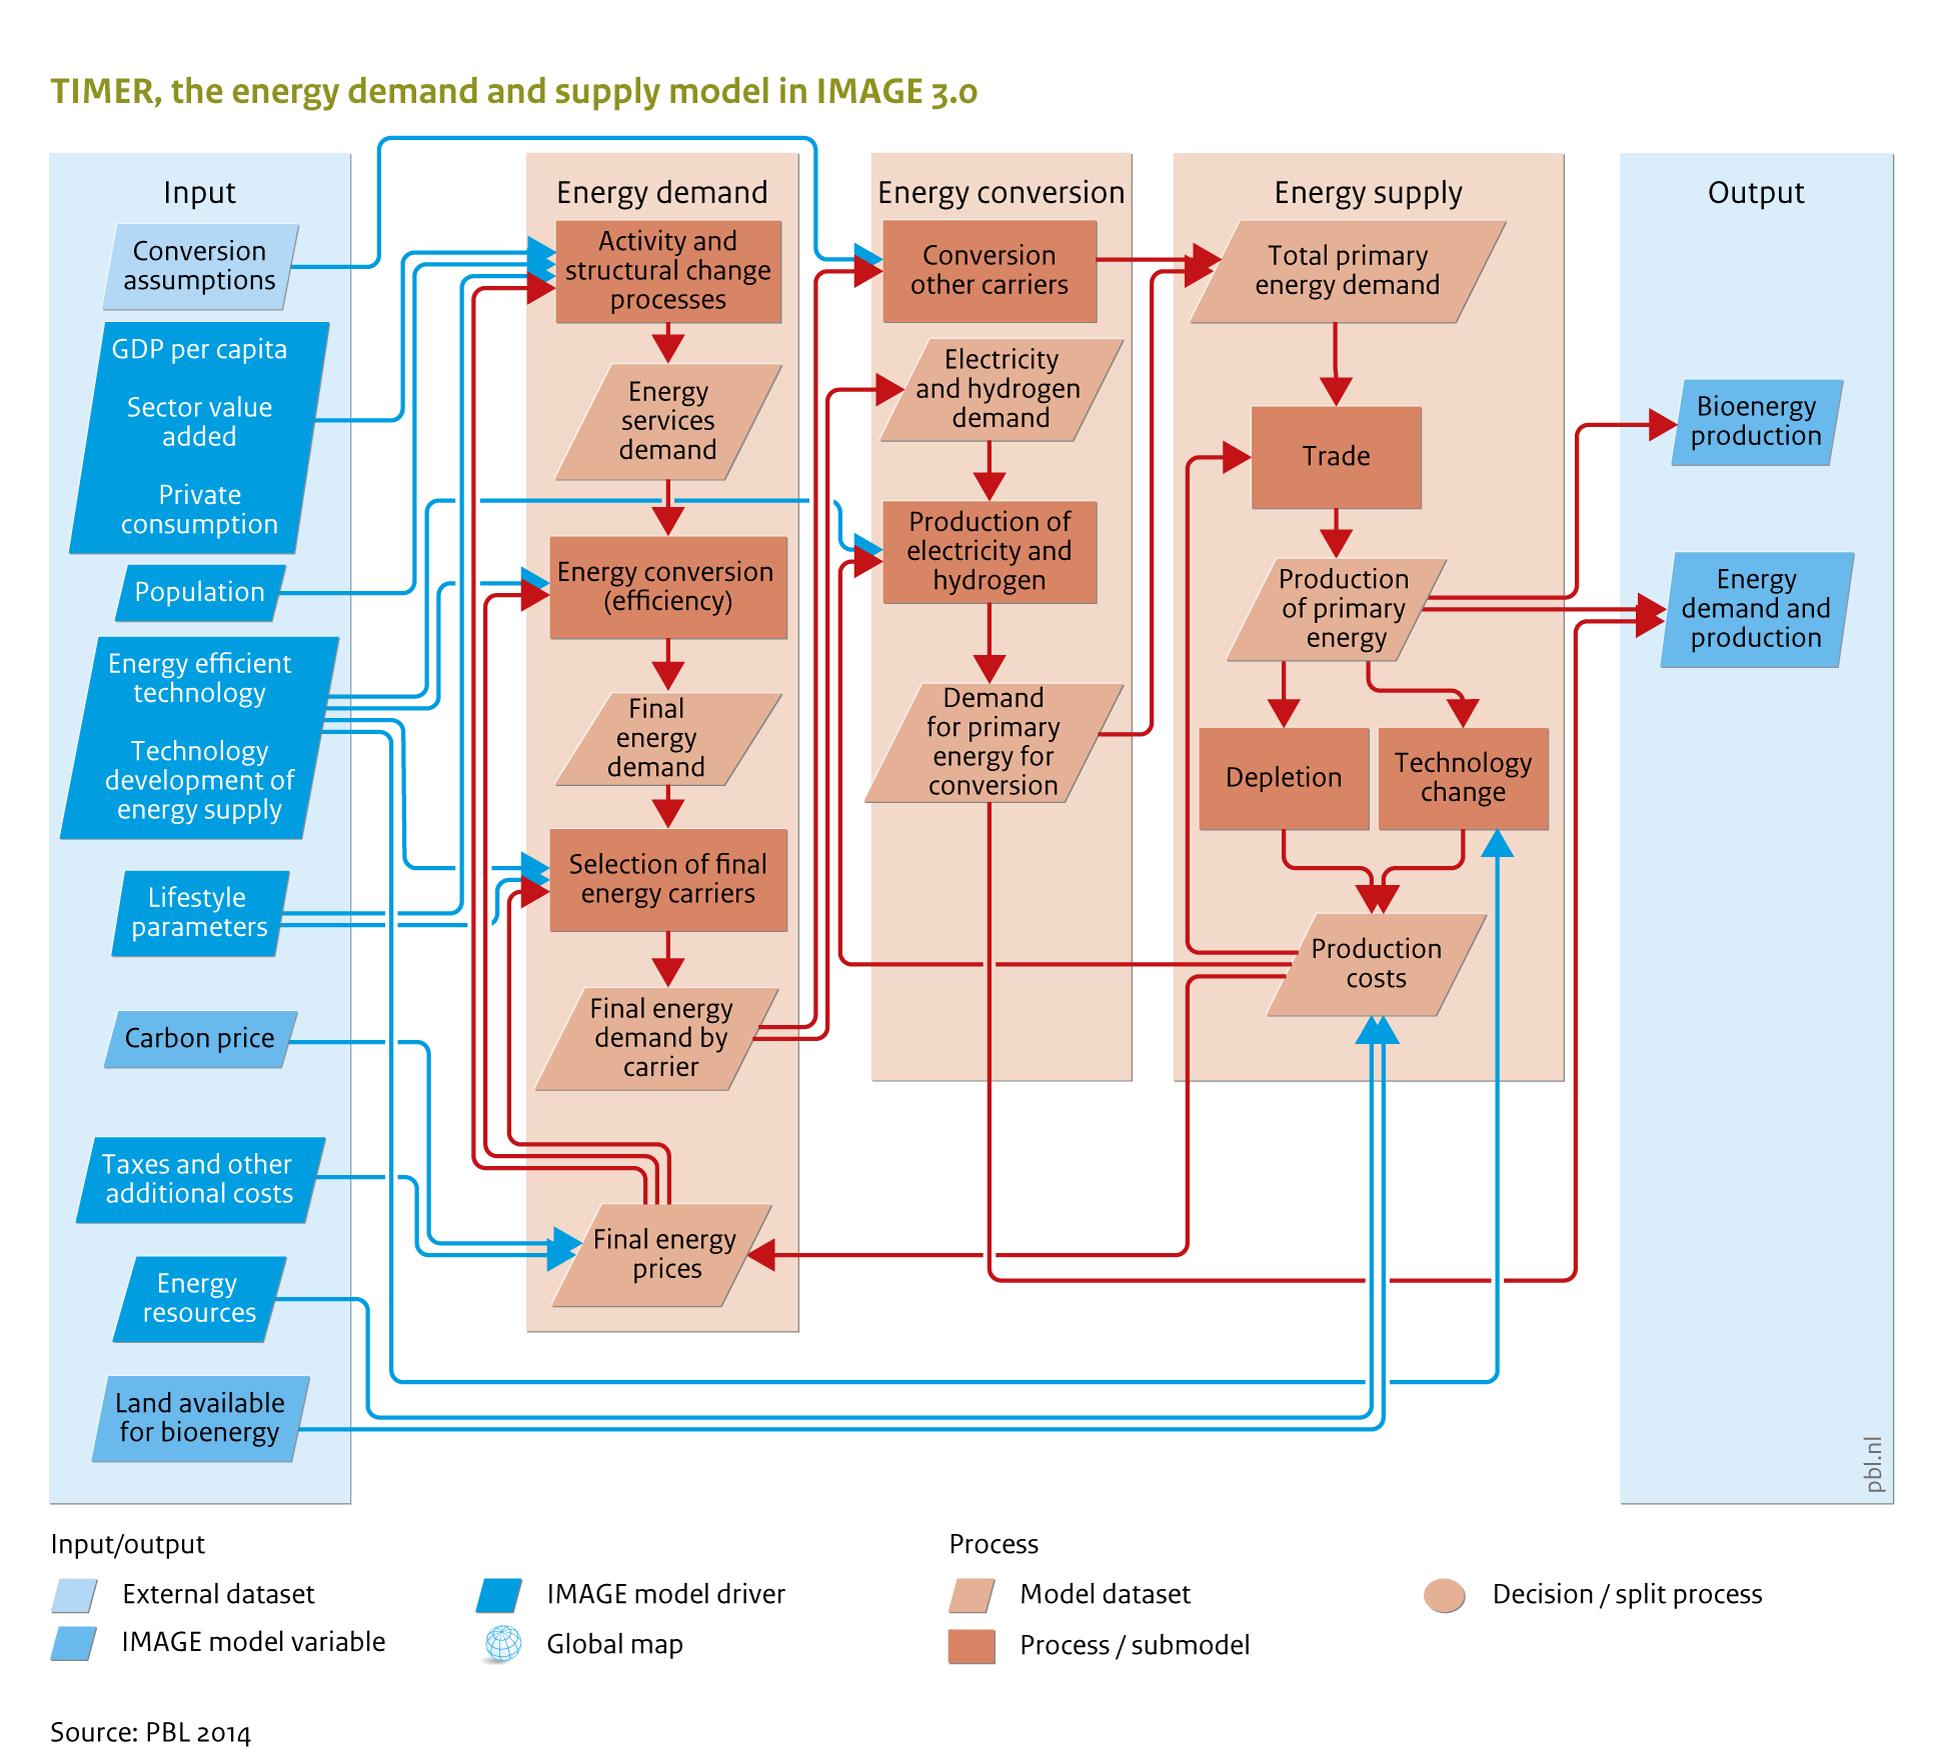 Flowchart energy supply and demand image view image nvjuhfo Choice Image